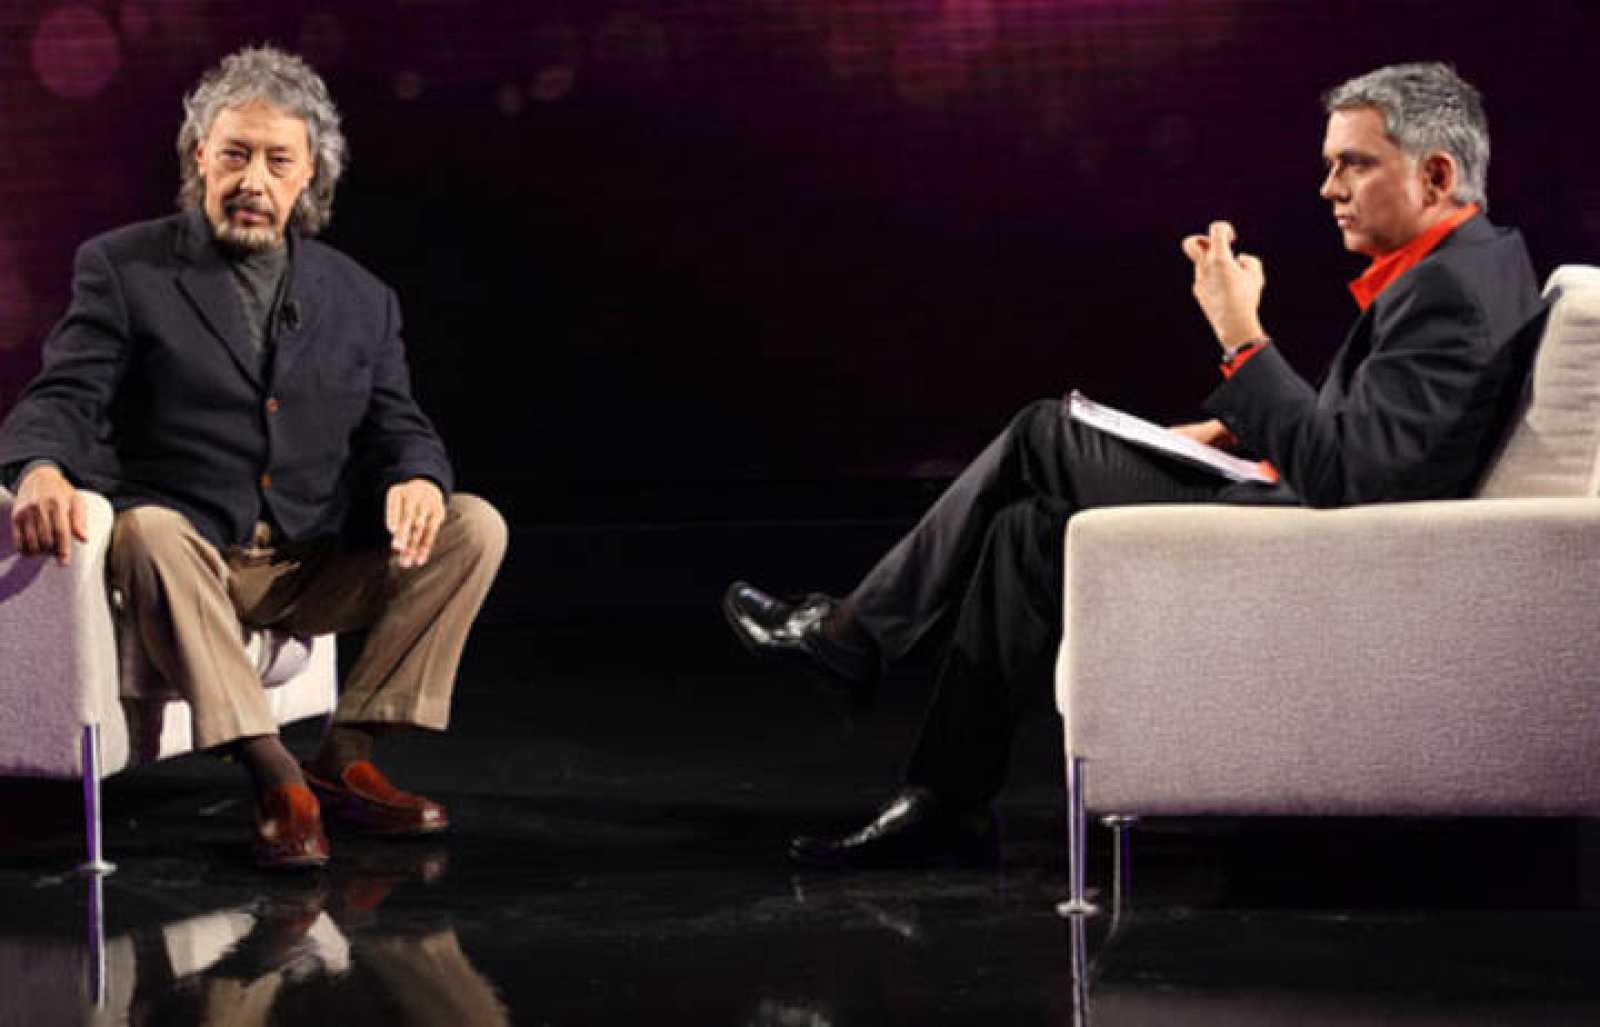 Lluís Llongueras, junto a Juan Ramón Lucas, en el programa 'En noches como ésta'